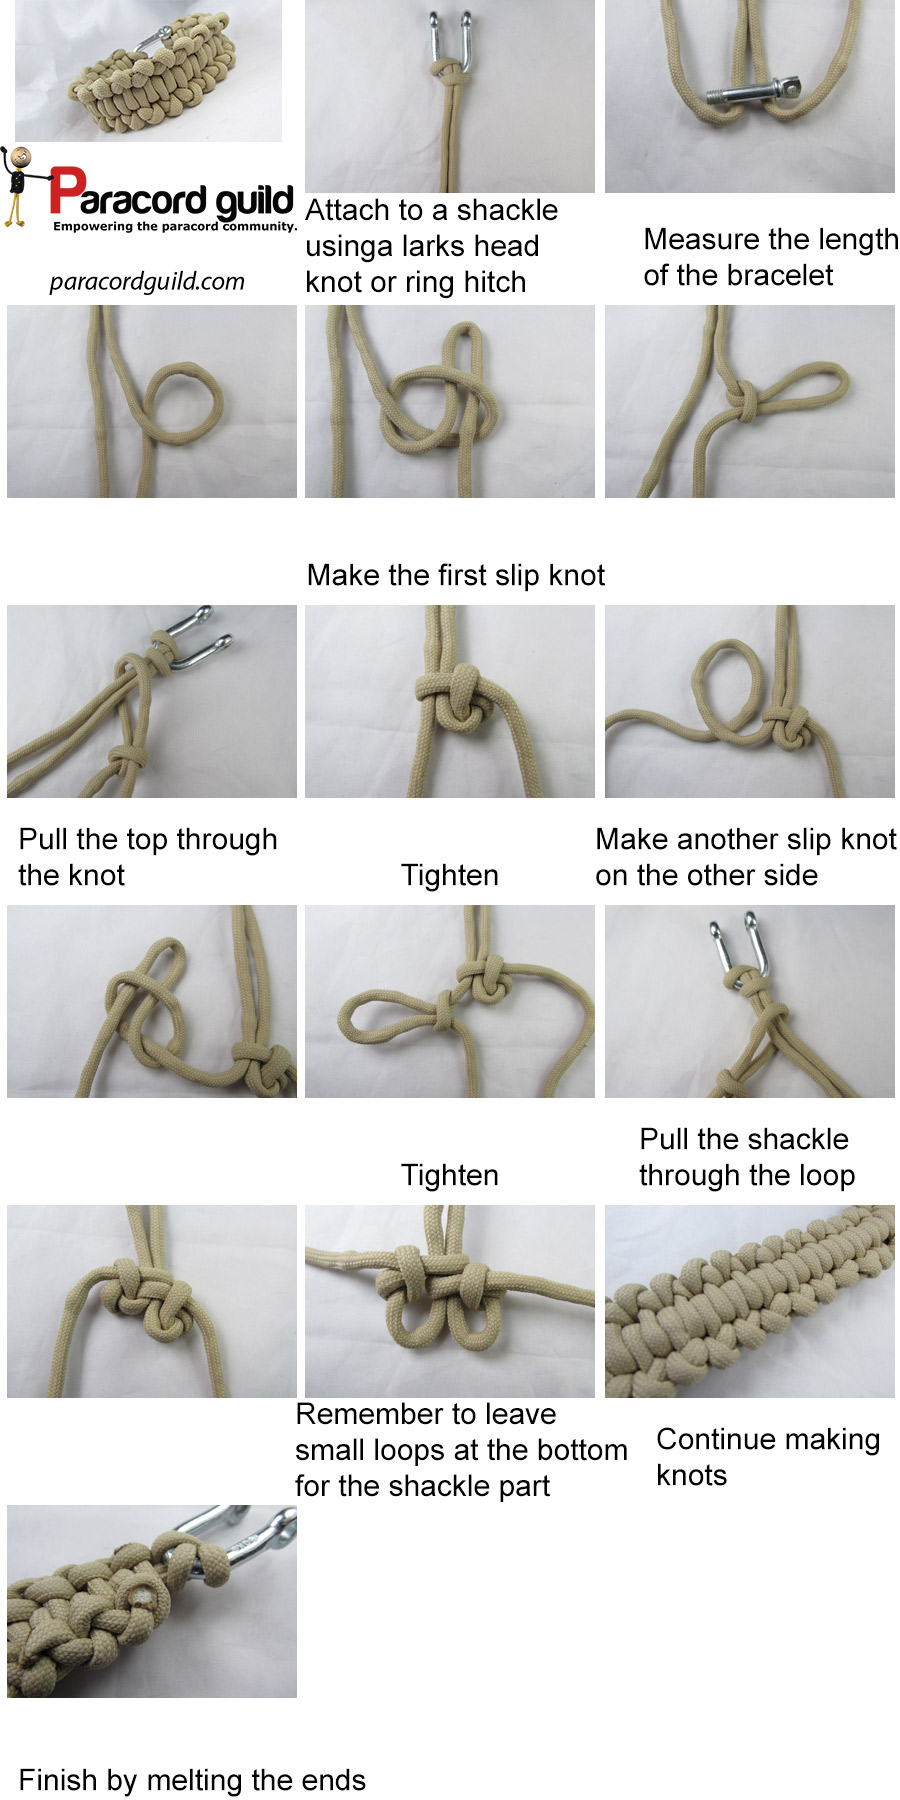 how to make a backbone bar paracord bracelet